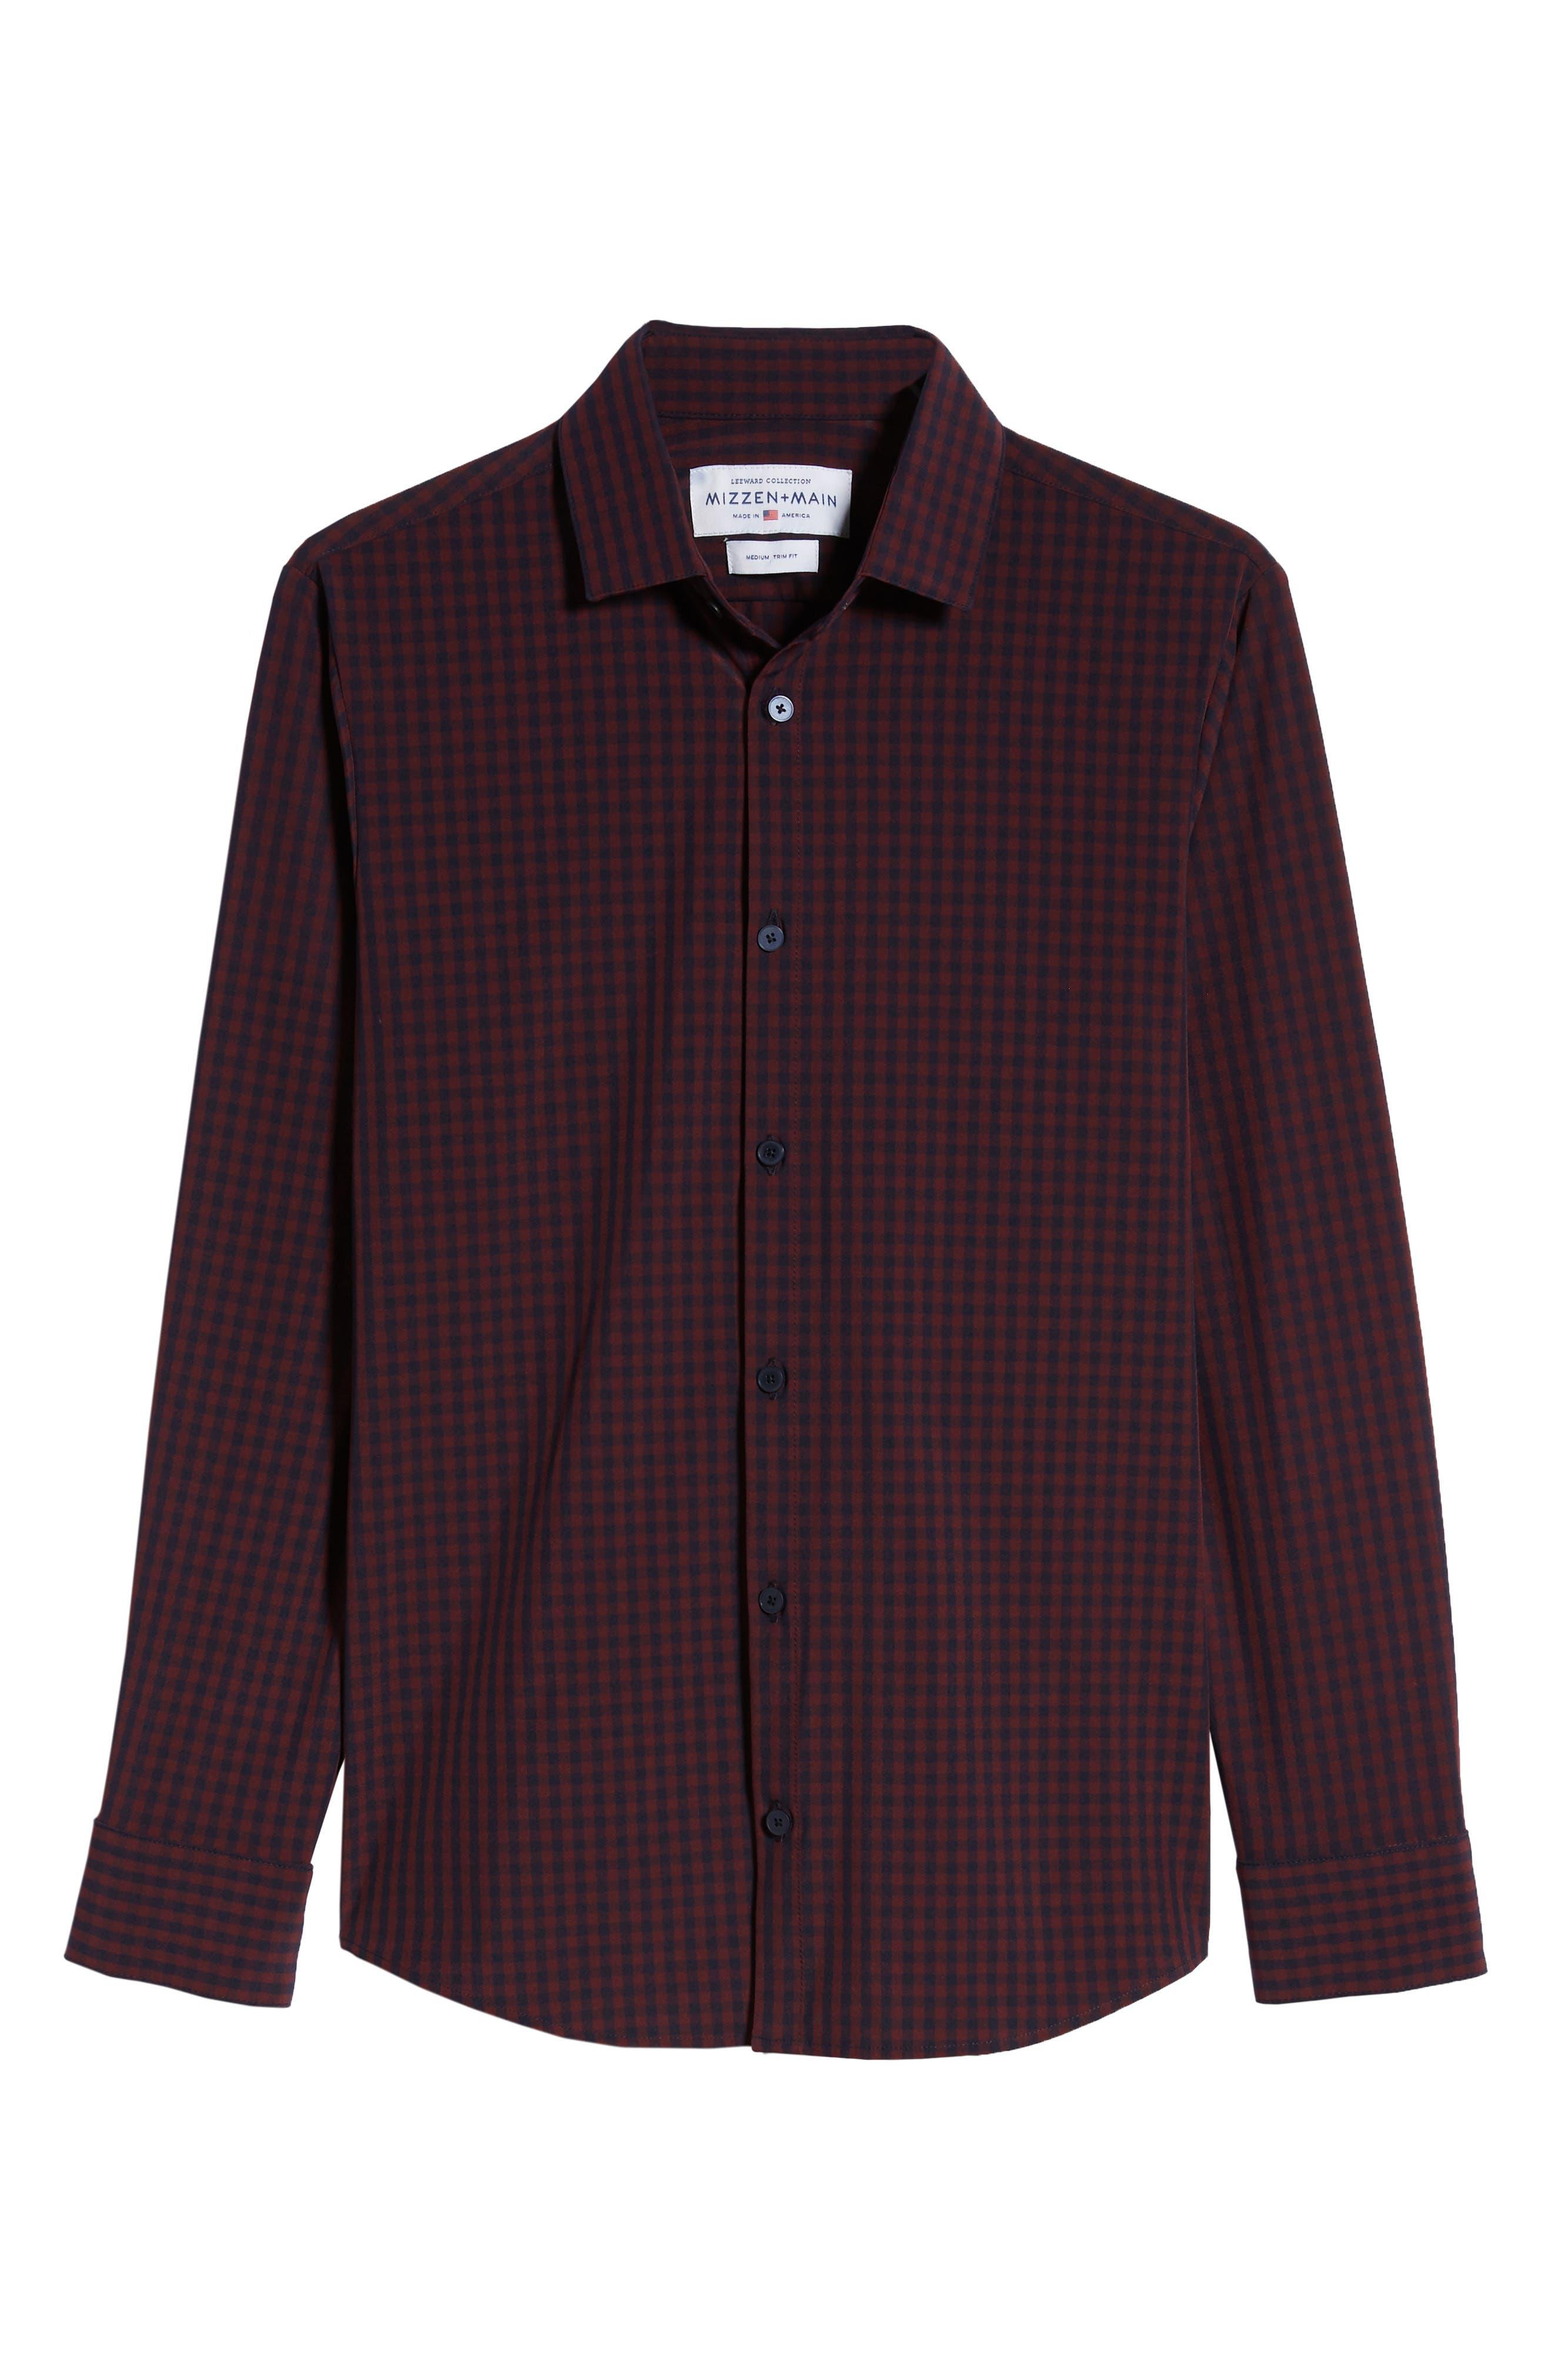 Marshall Check Sport Shirt,                             Alternate thumbnail 5, color,                             BURGUNDY